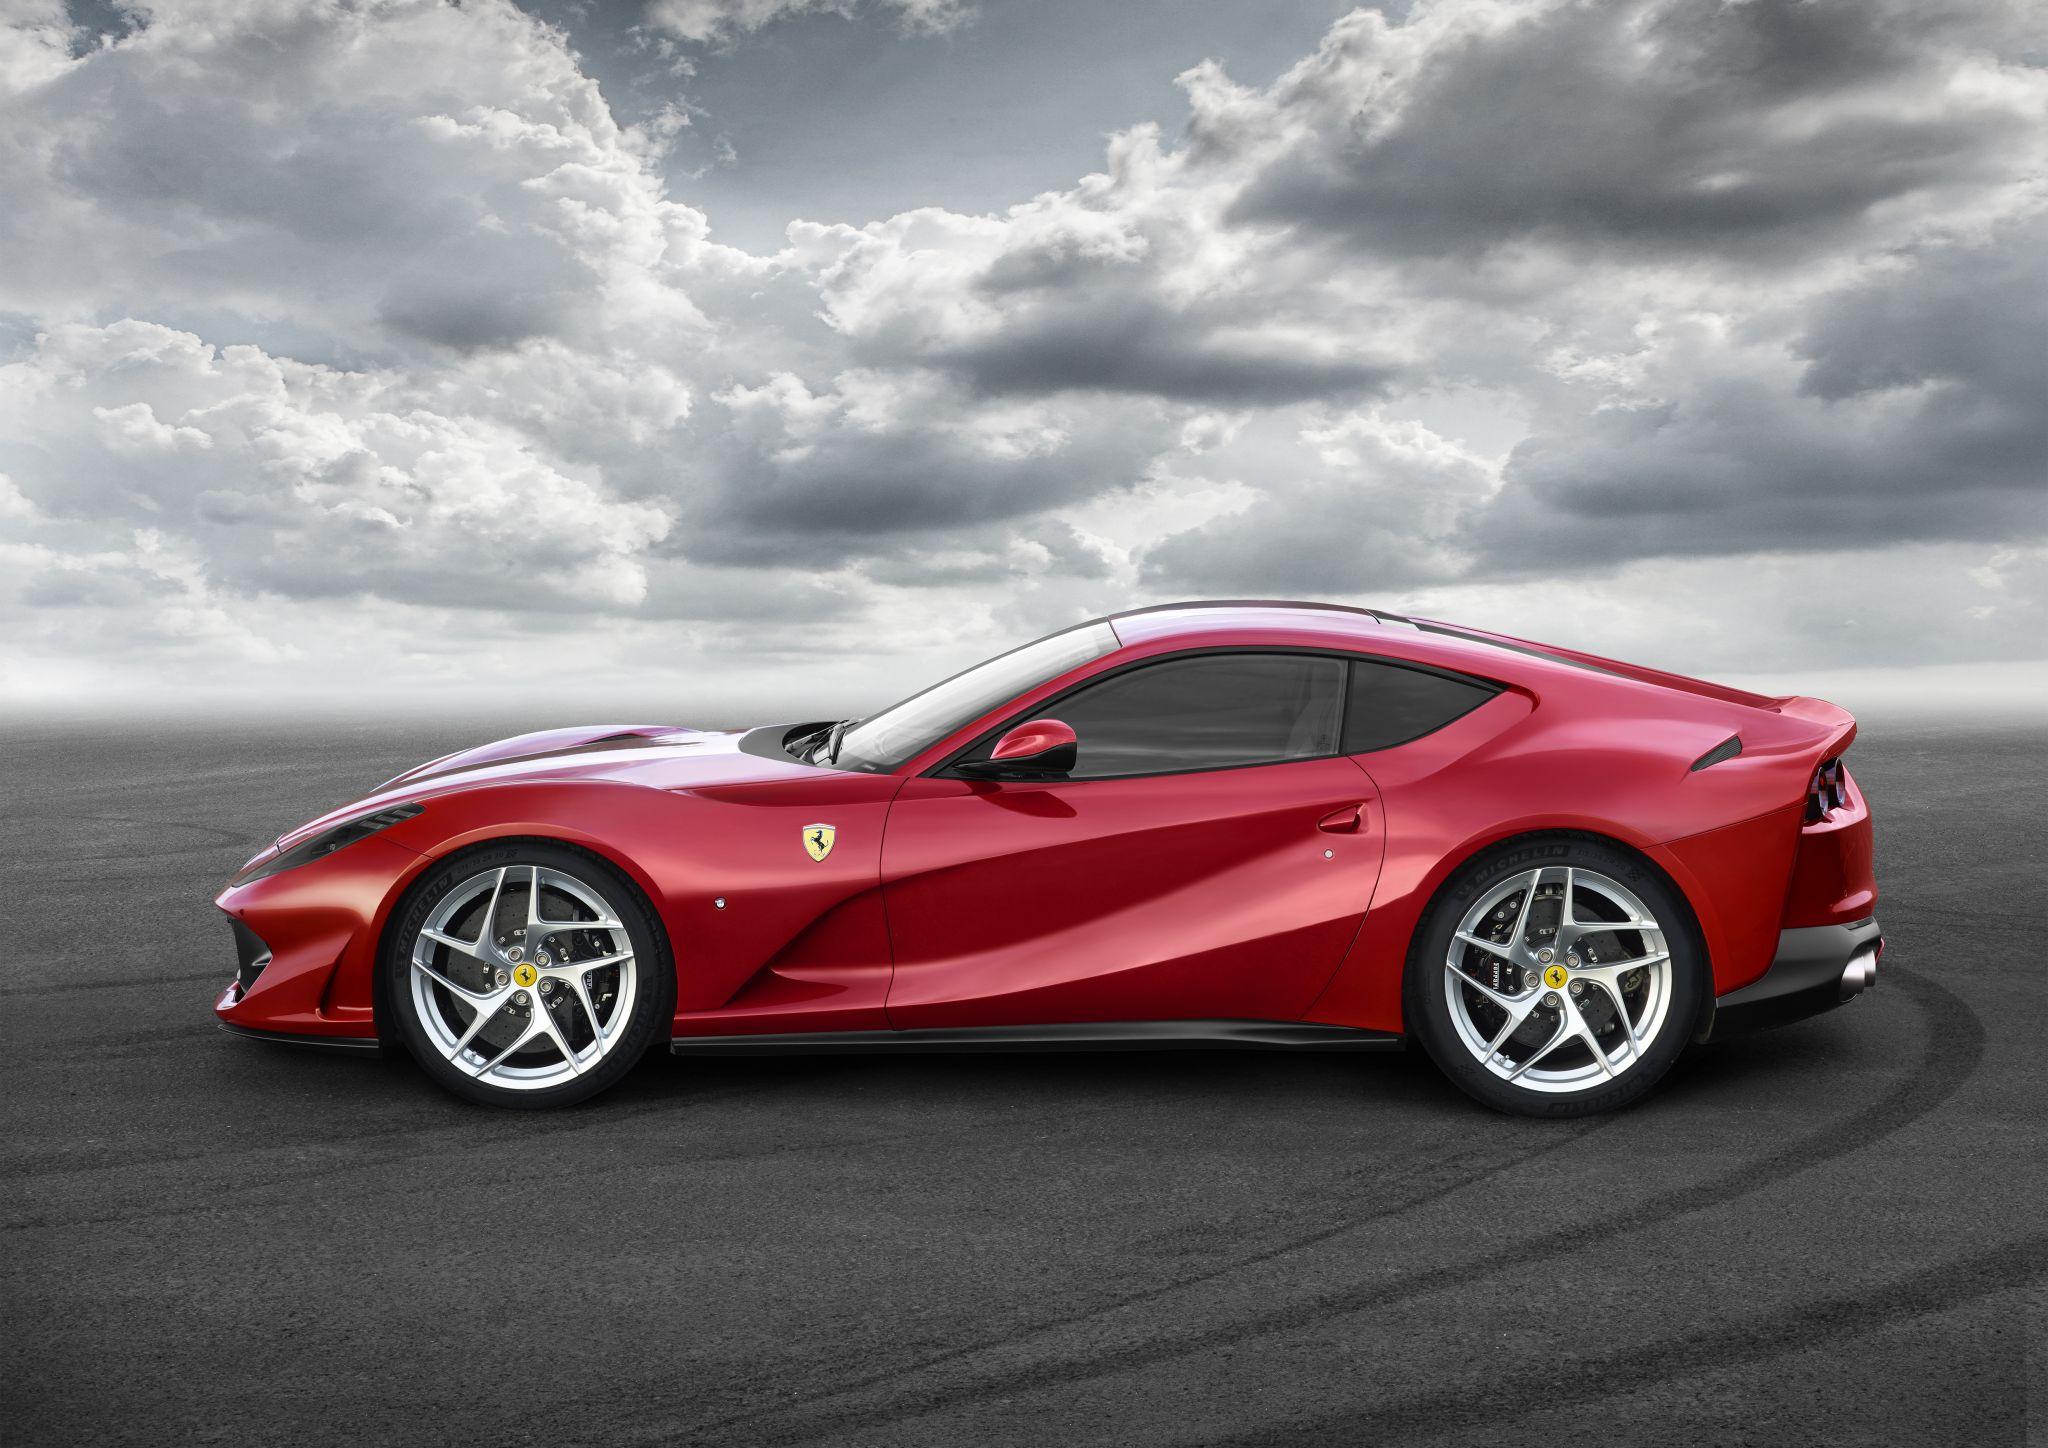 Ferrari driver gets a tough parking lesson